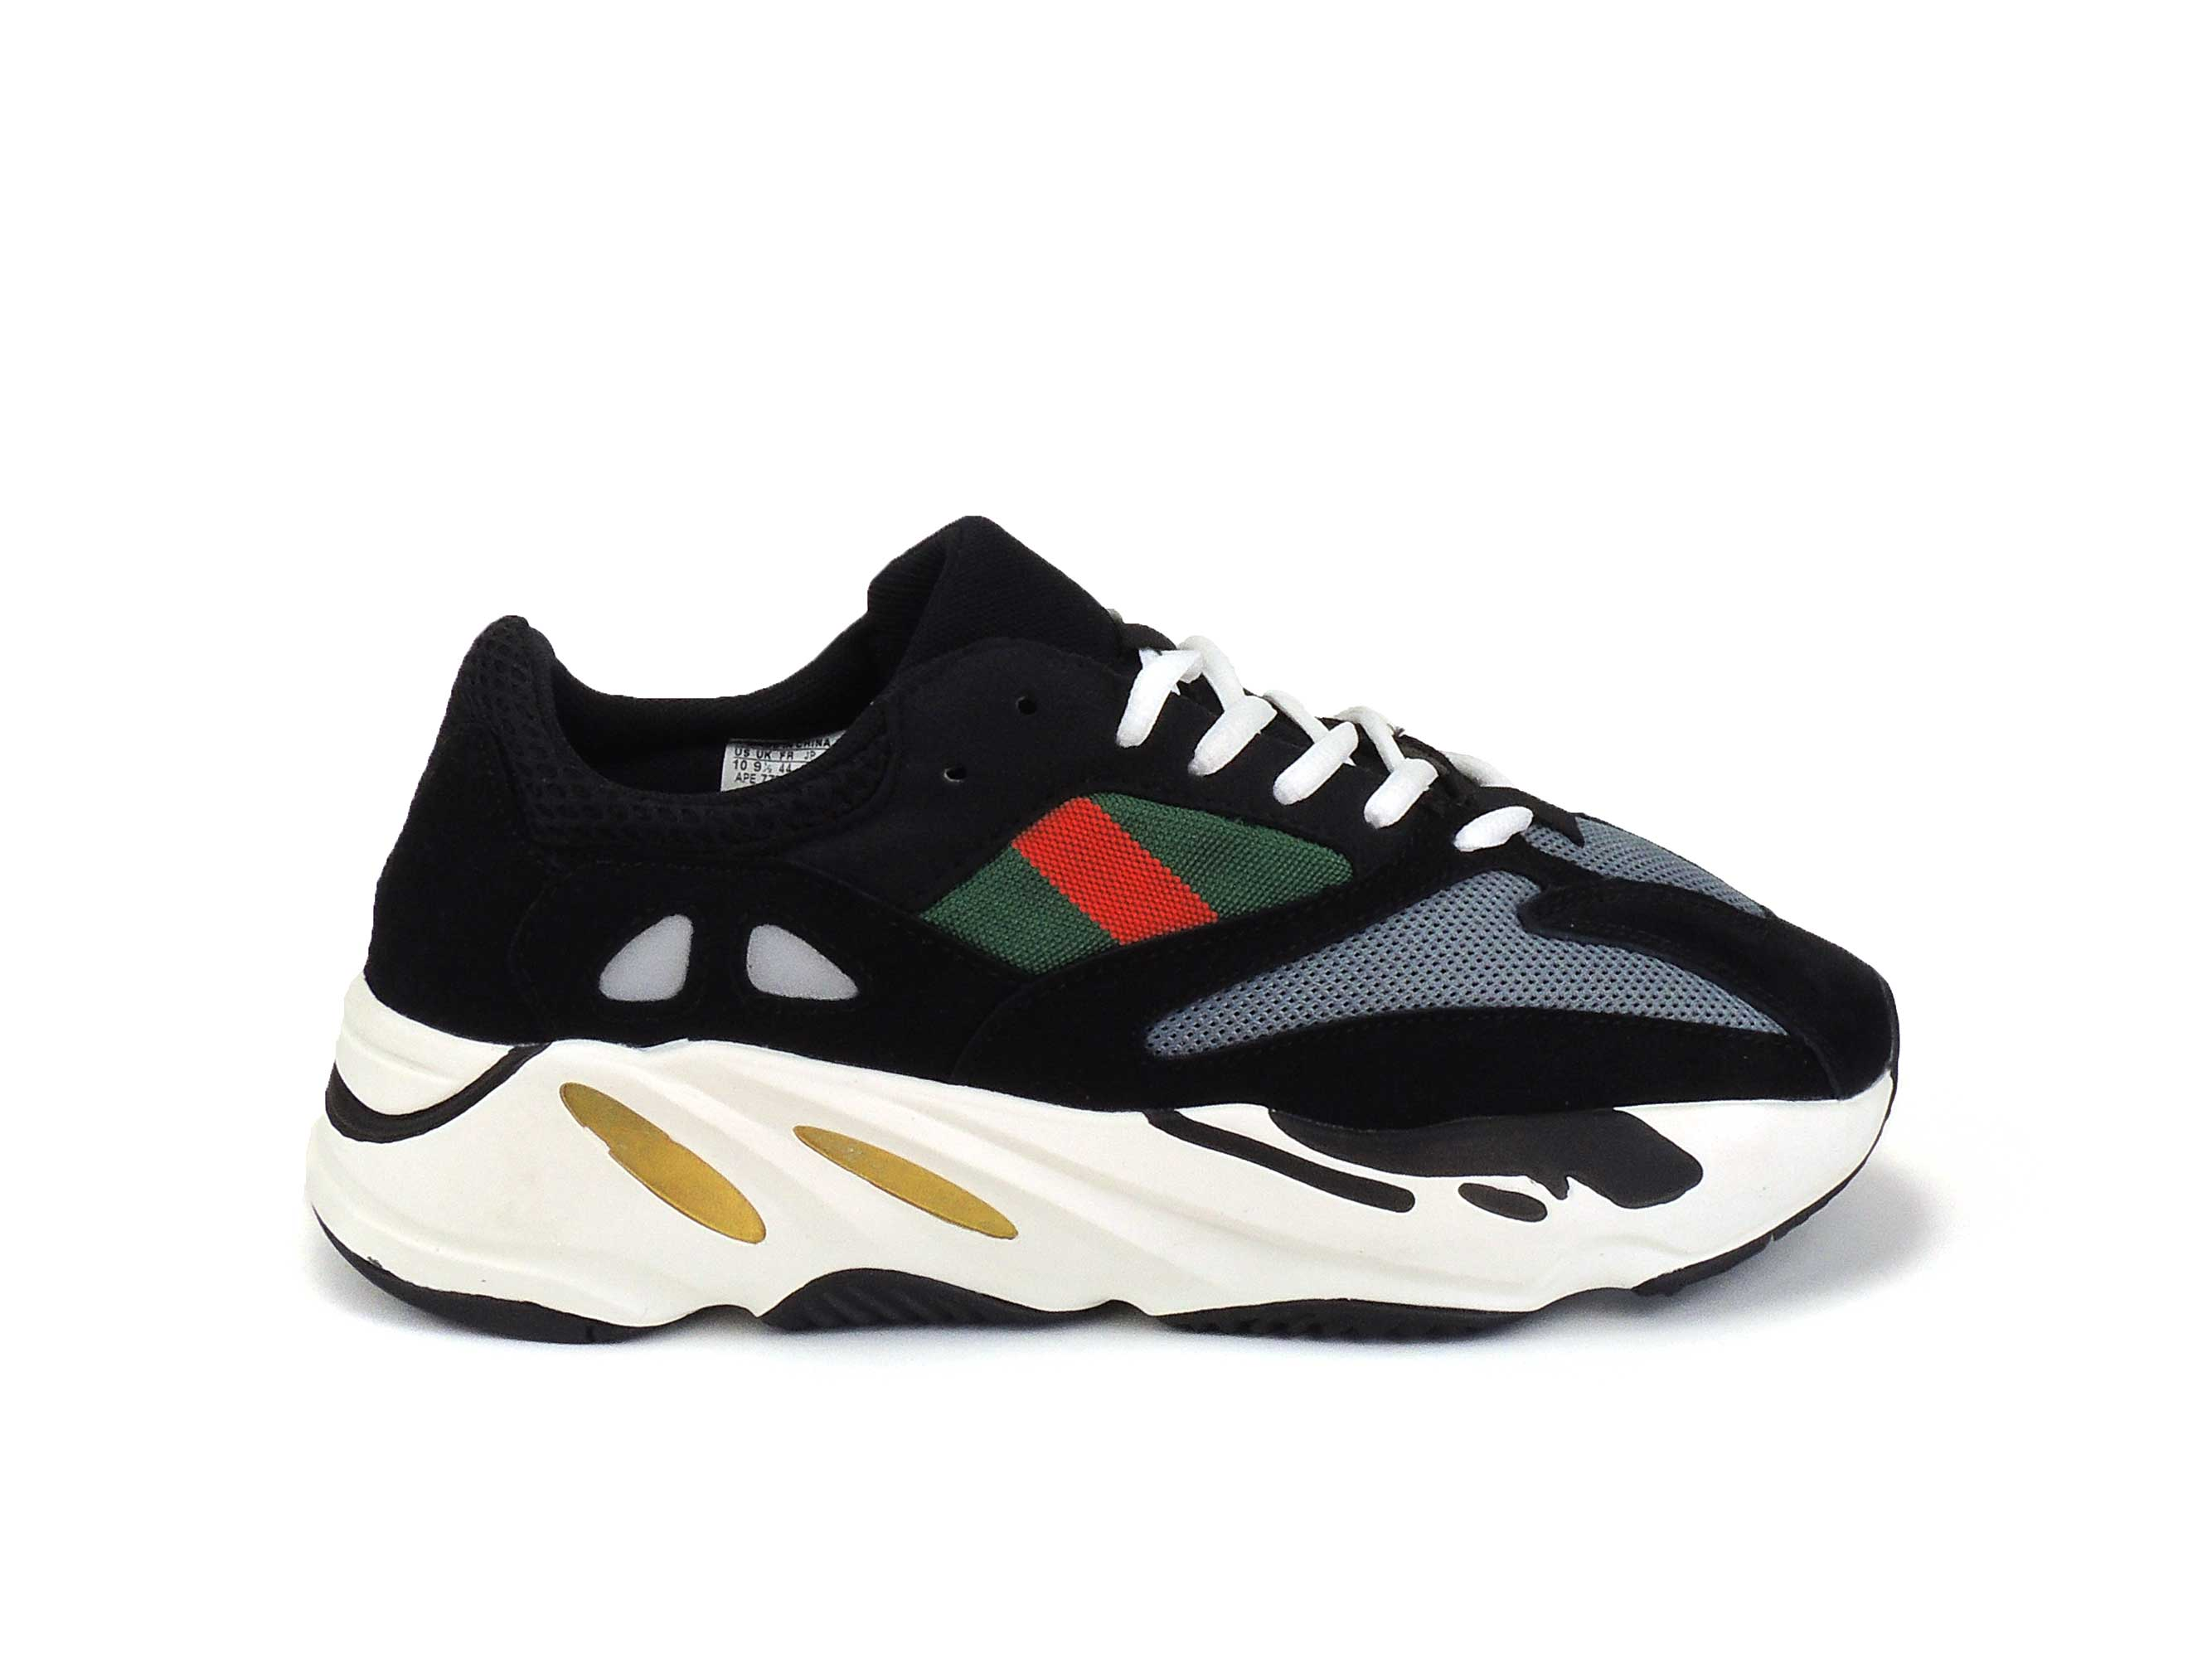 watch 5b9a5 a4890 adidas yeezy 700 boost wave runner black white